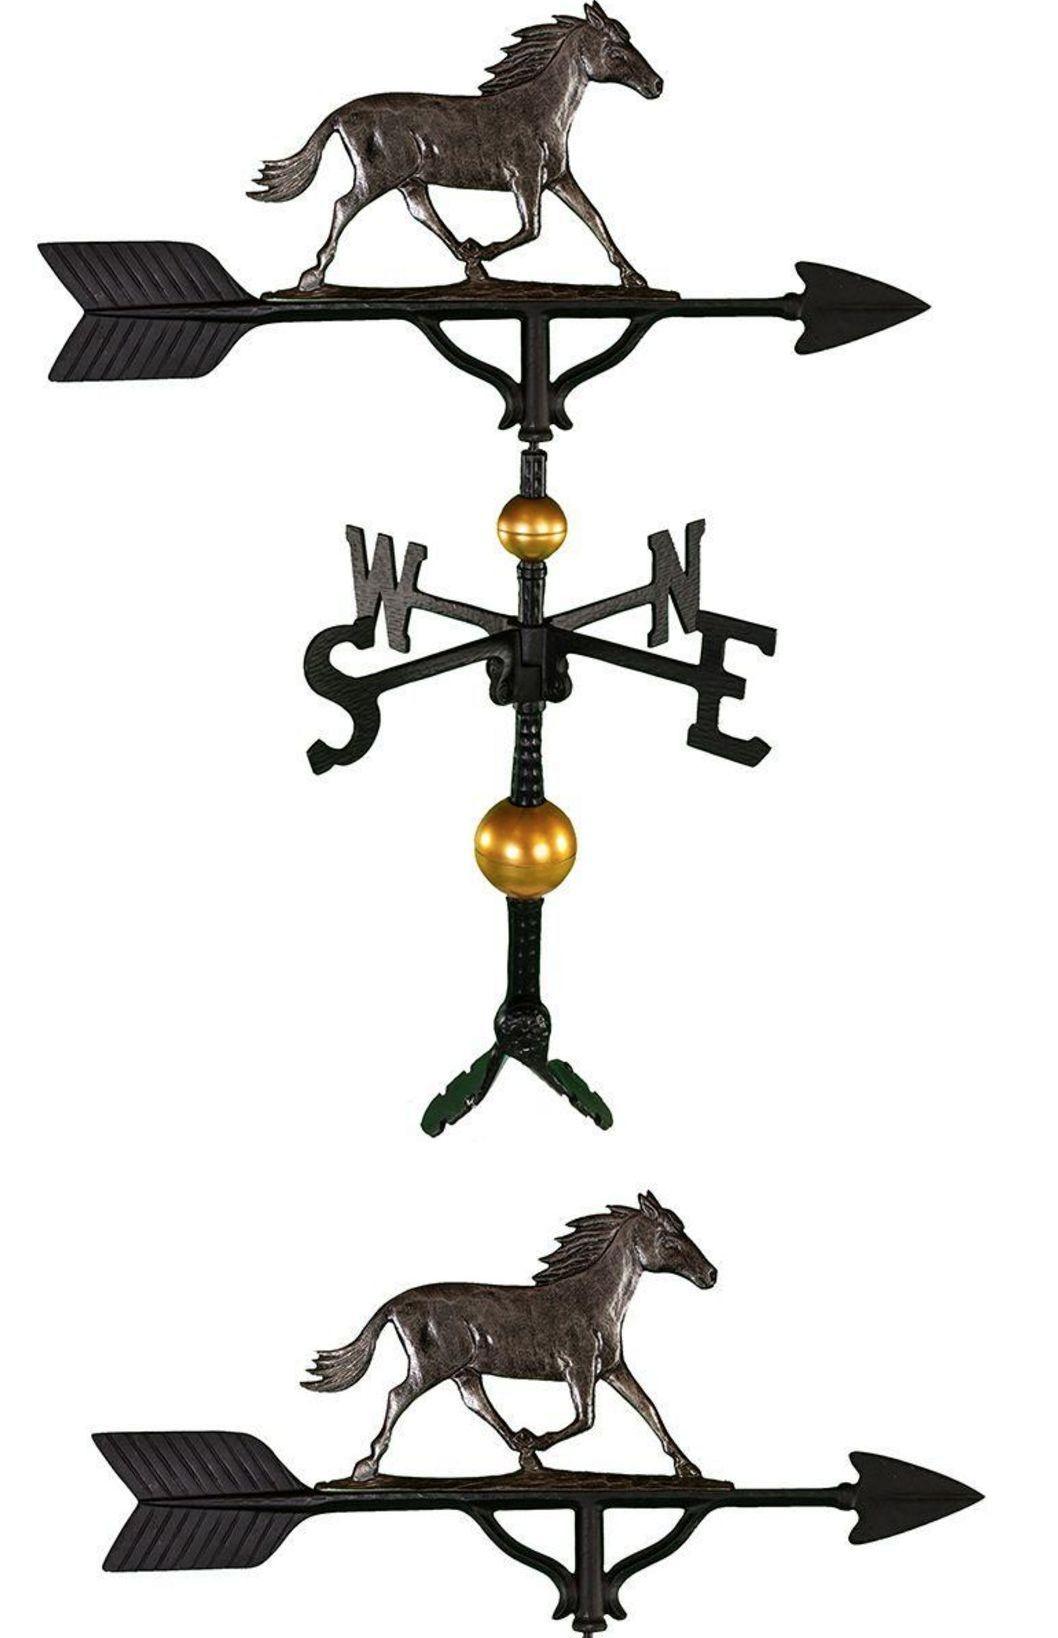 Weathervanes 20512: 32 In. Horse Weathervane Roof Mount Weather Vane Weather Resistant Garden Decor -> BUY IT NOW ONLY: $88.26 on eBay!